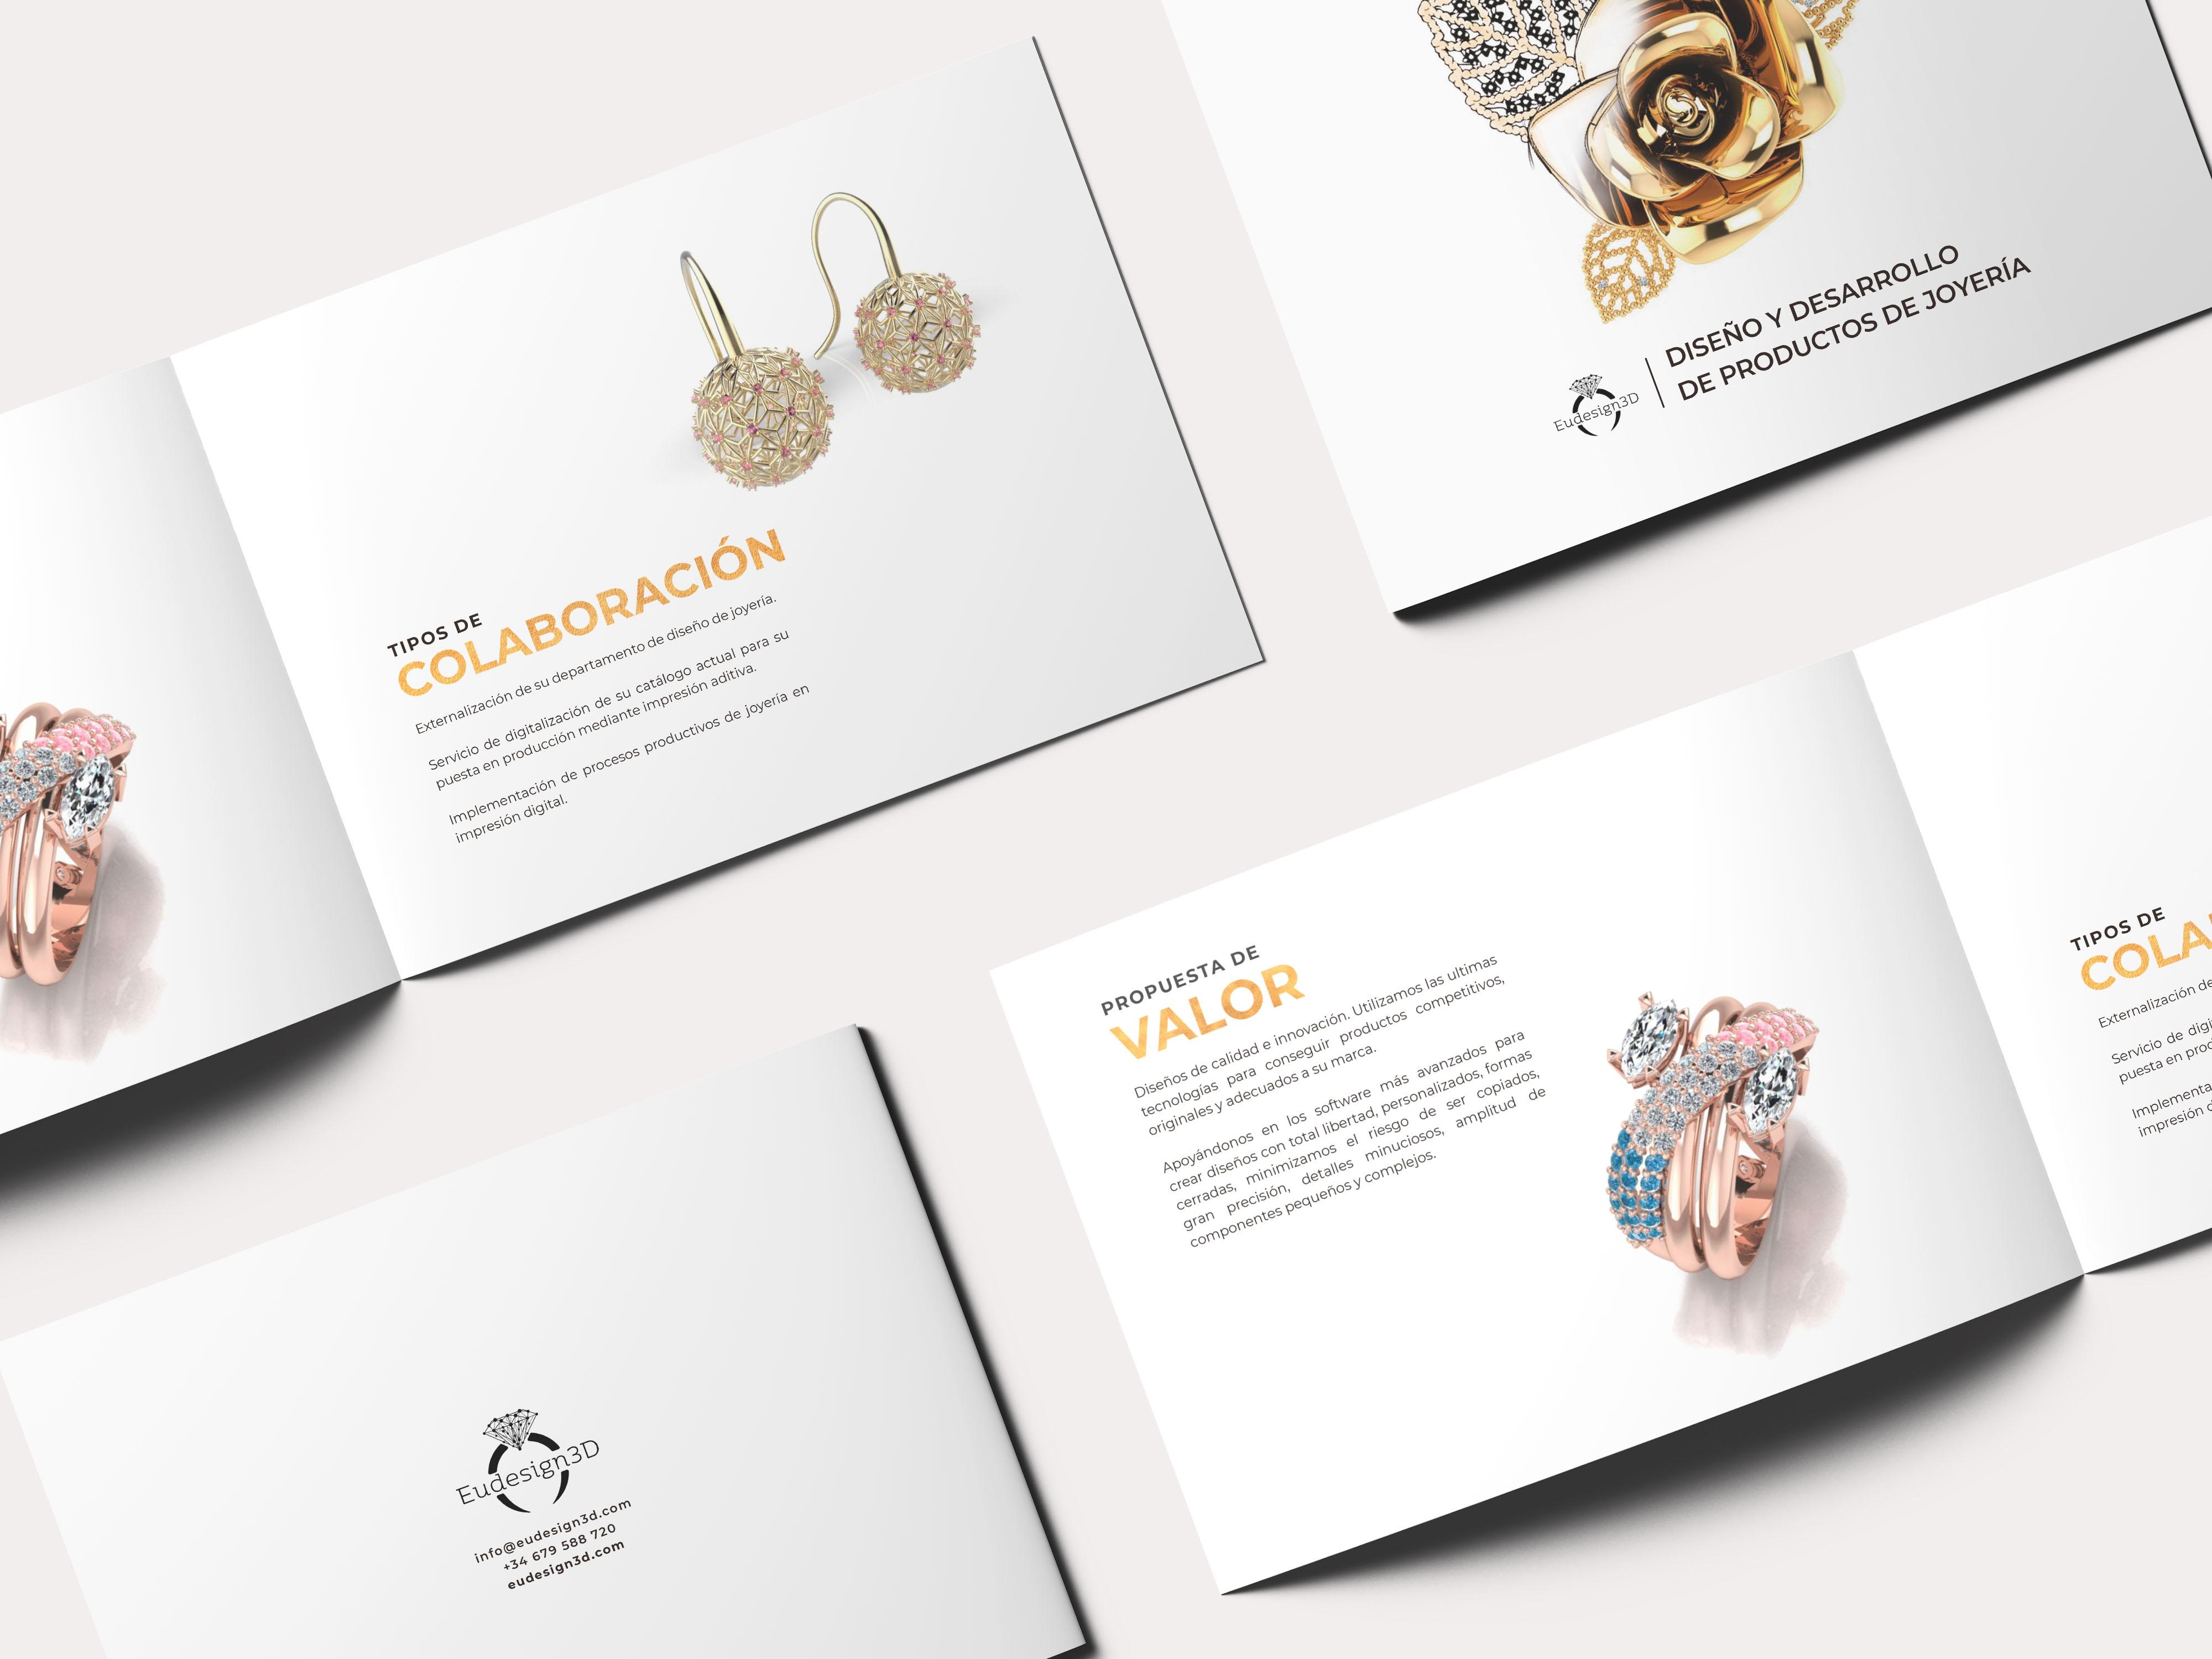 diseño de catalogo impreso